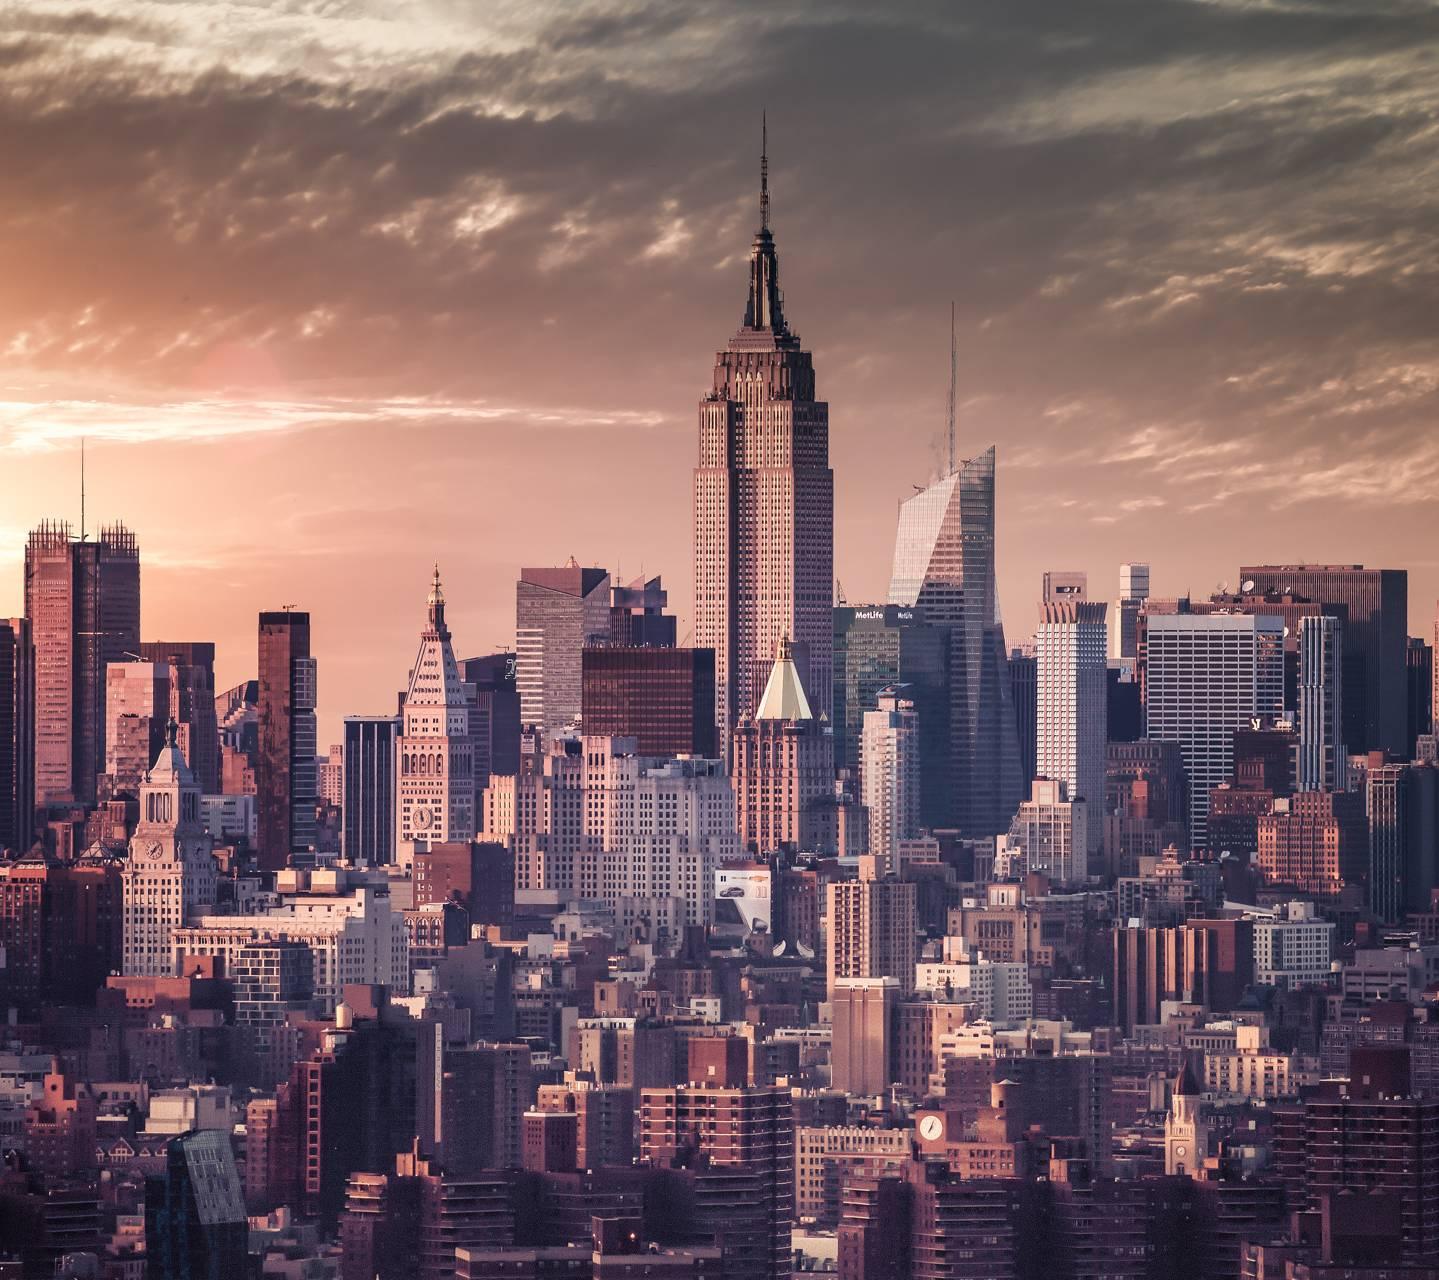 New York Skyline Wallpaper: New York Skyline 5K Wallpaper By Qwertz12333